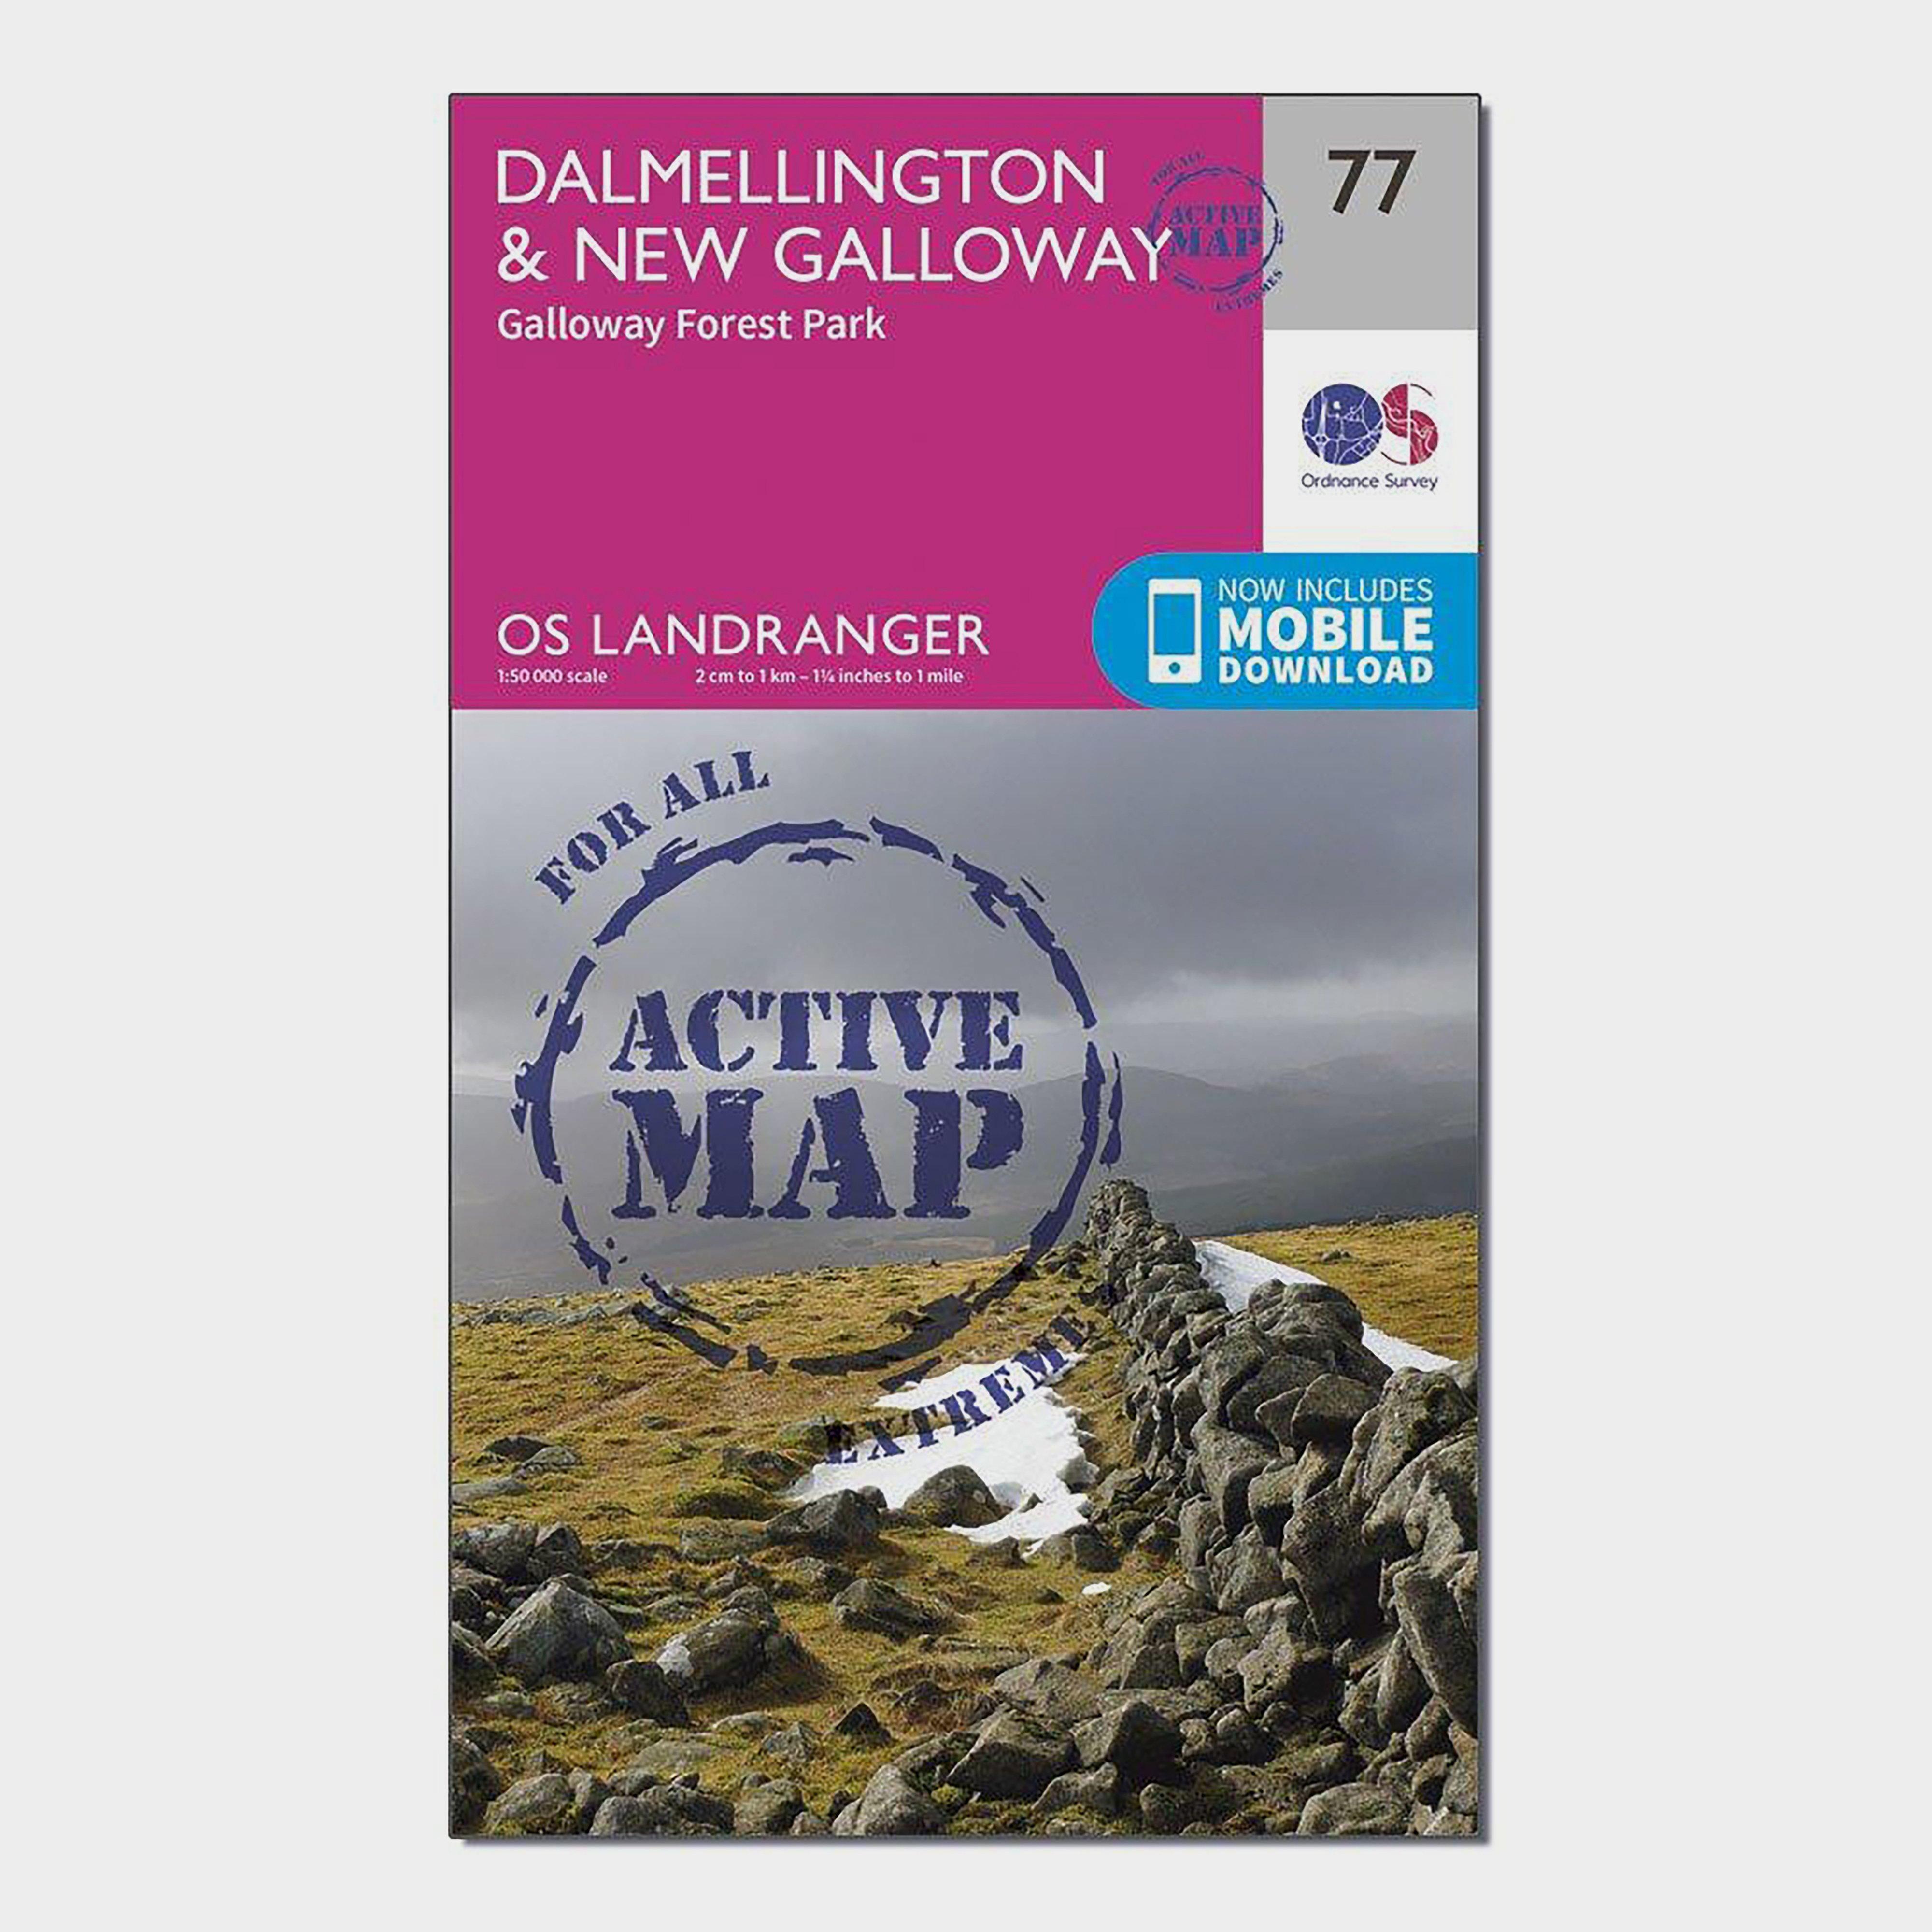 Ordnance Survey Landranger Active 77 DalmellingtonandNew Galloway  Galloway Forest Park Map With Digital Version - Pink/d  Pink/d